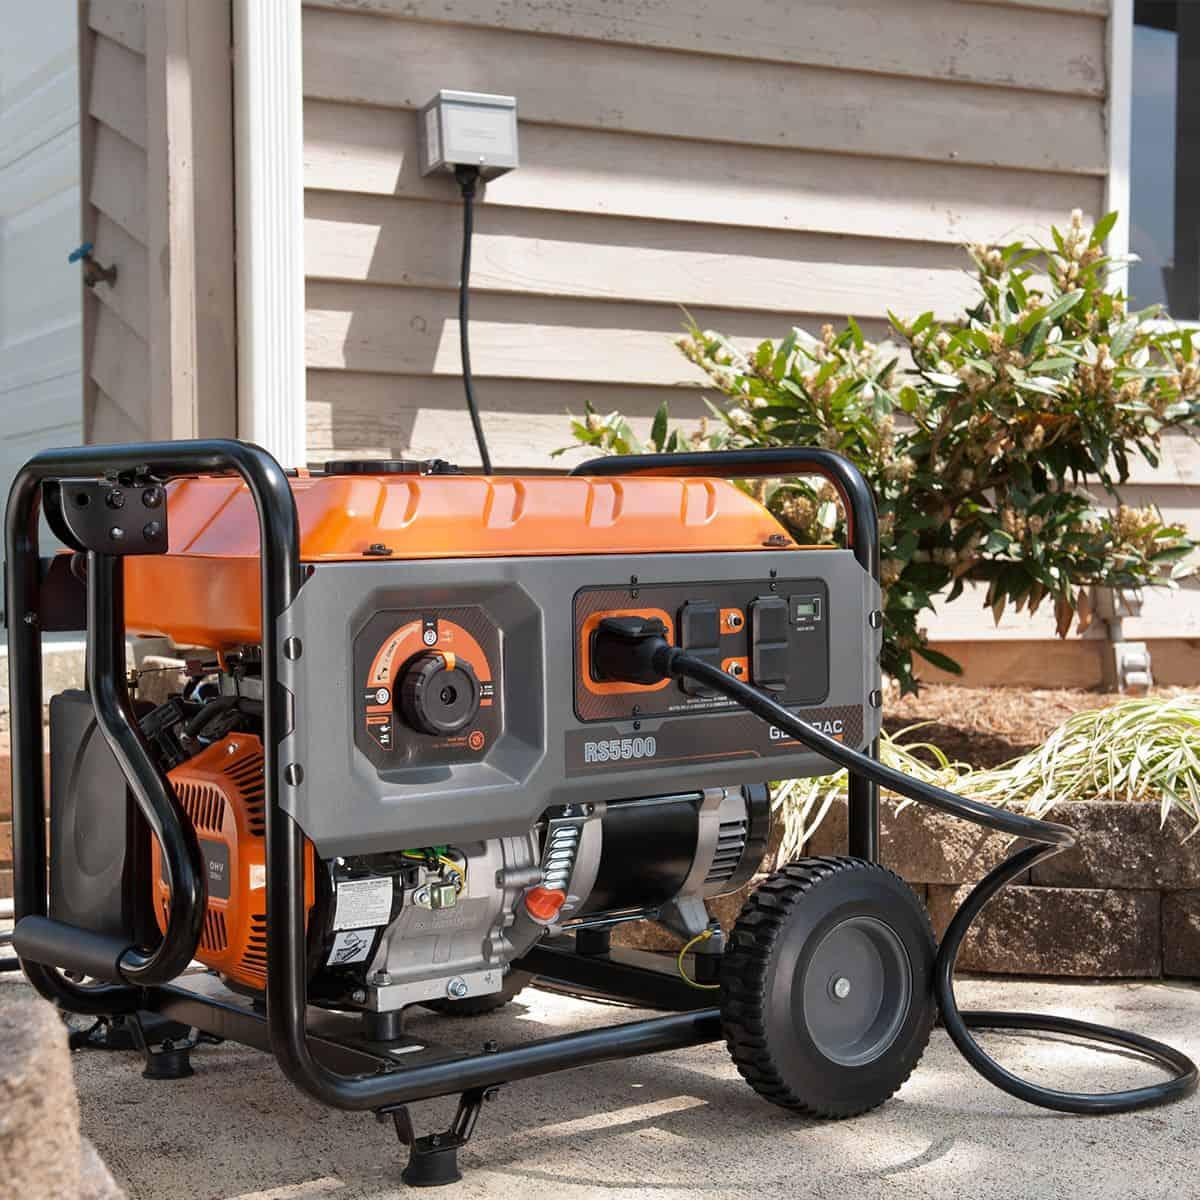 RS Series Watt Rapid Start Portable Generator